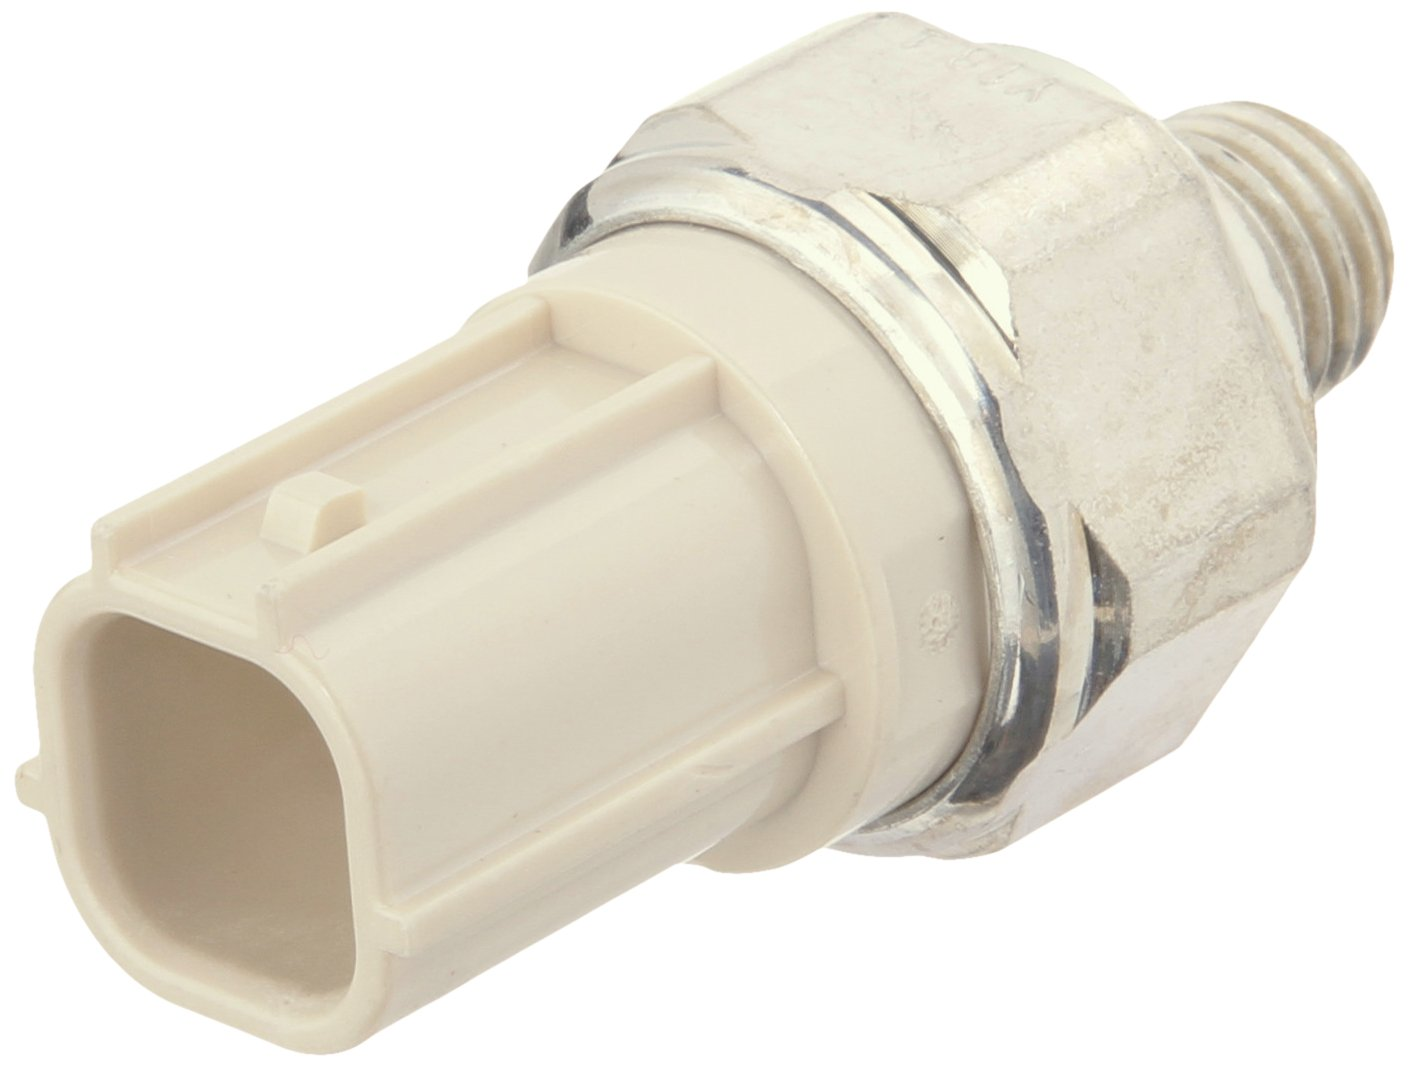 Genuine Honda 28600-RKE-004 Automatic Transmission Oil Pressure Switch Assembly